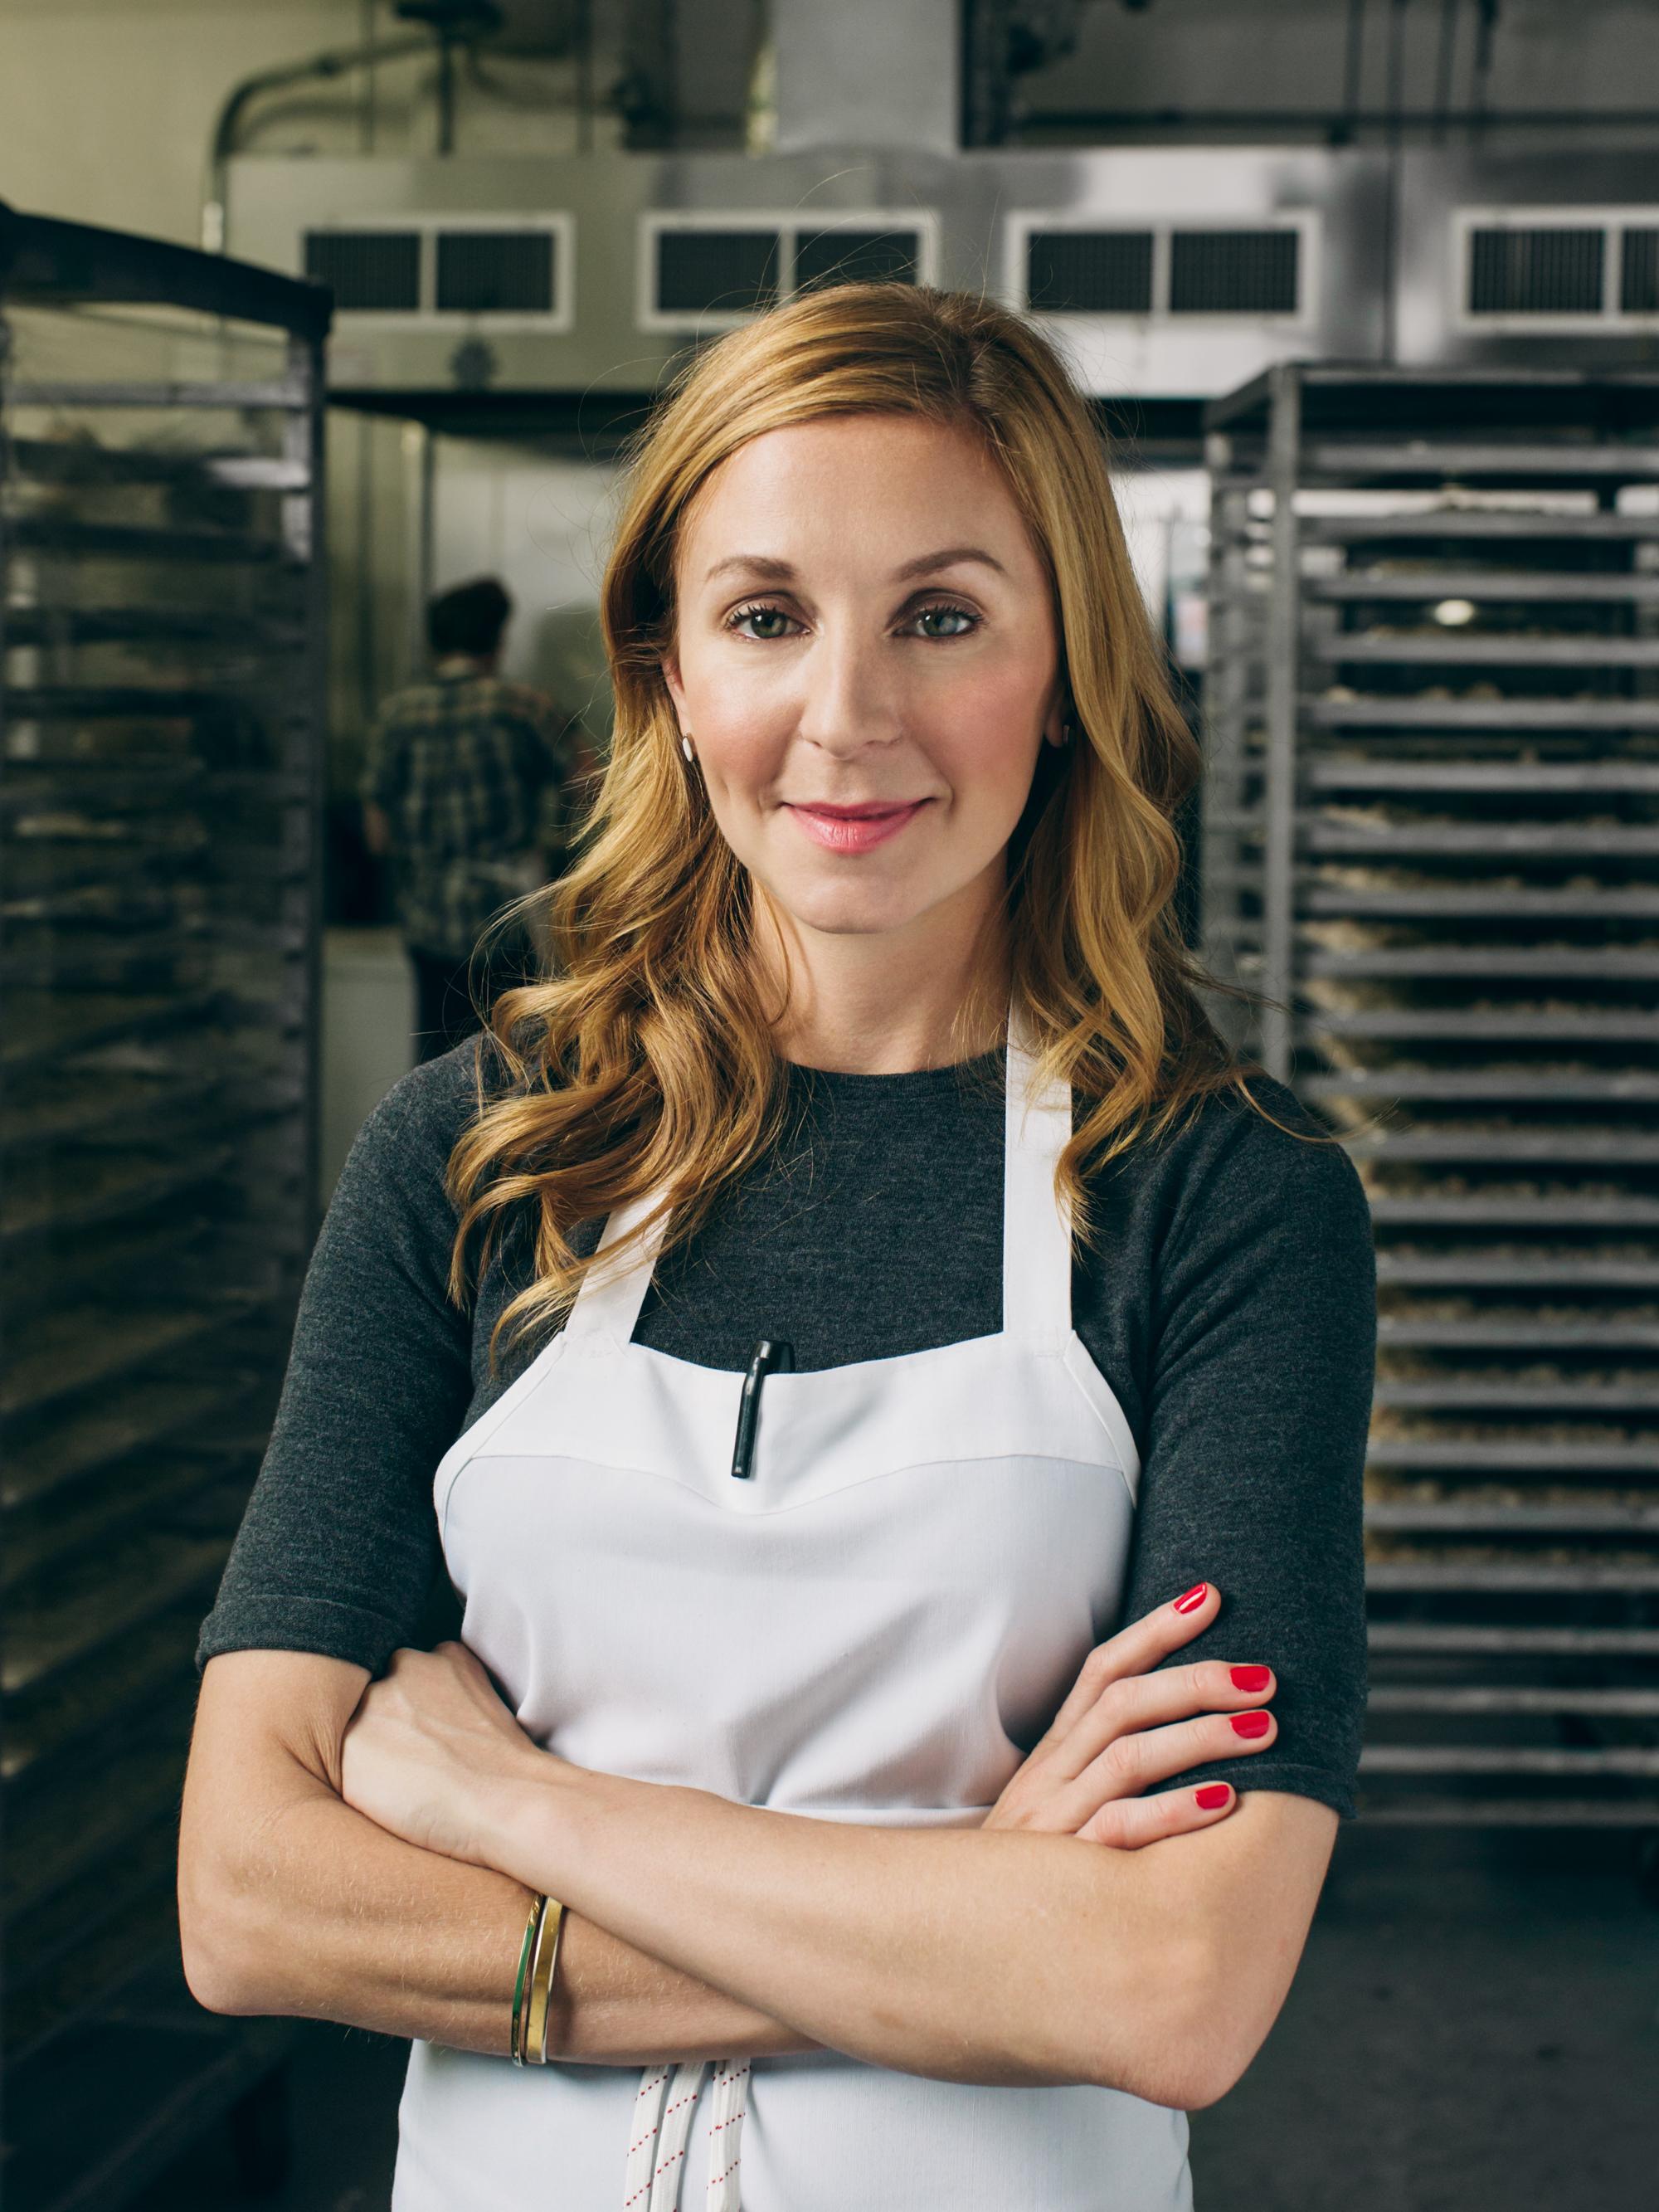 Christina Tosi, Chef and Owner of Momofuku Milk Bar  Estée Lauder